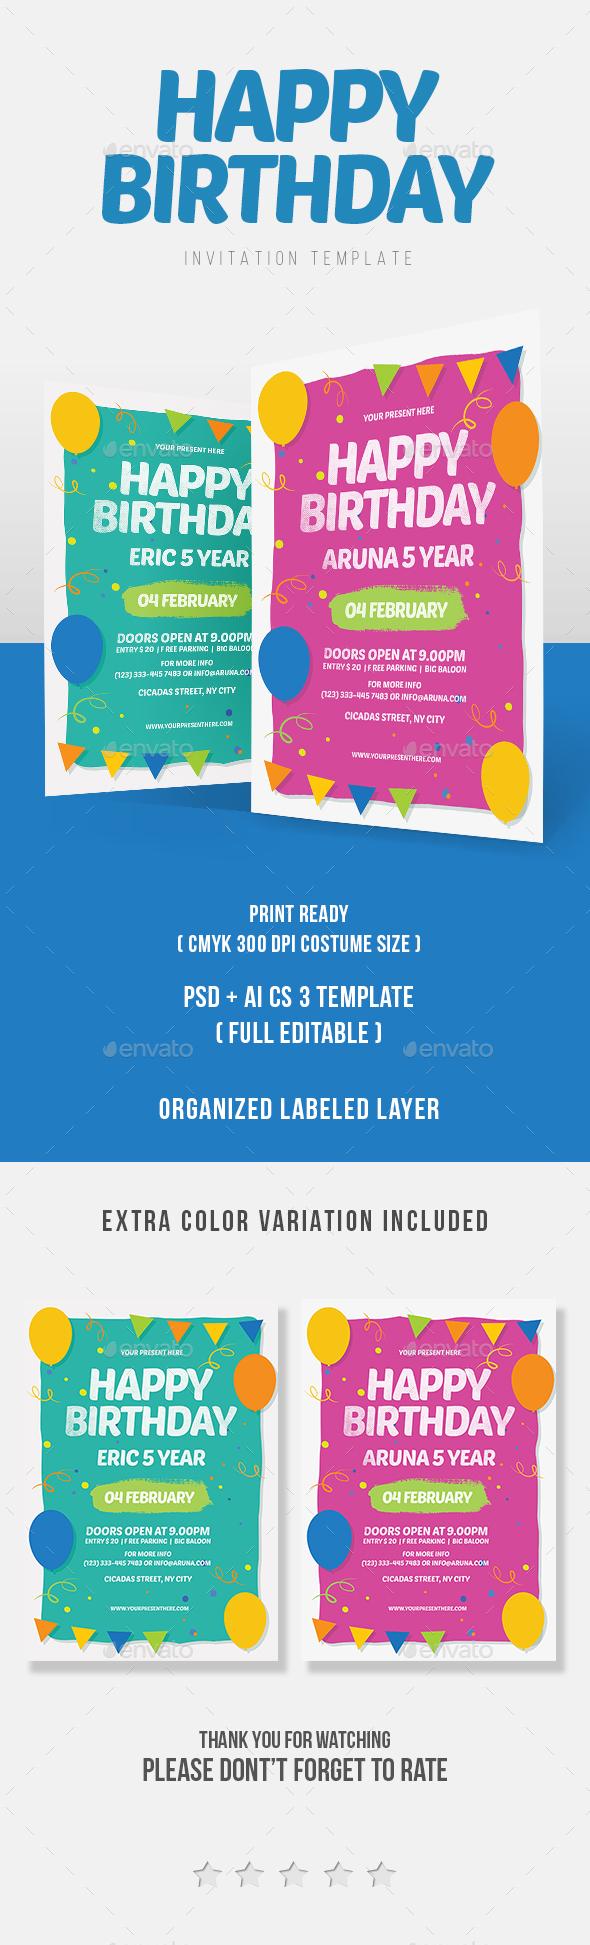 Happy Birthday Invitation - Invitations Cards & Invites